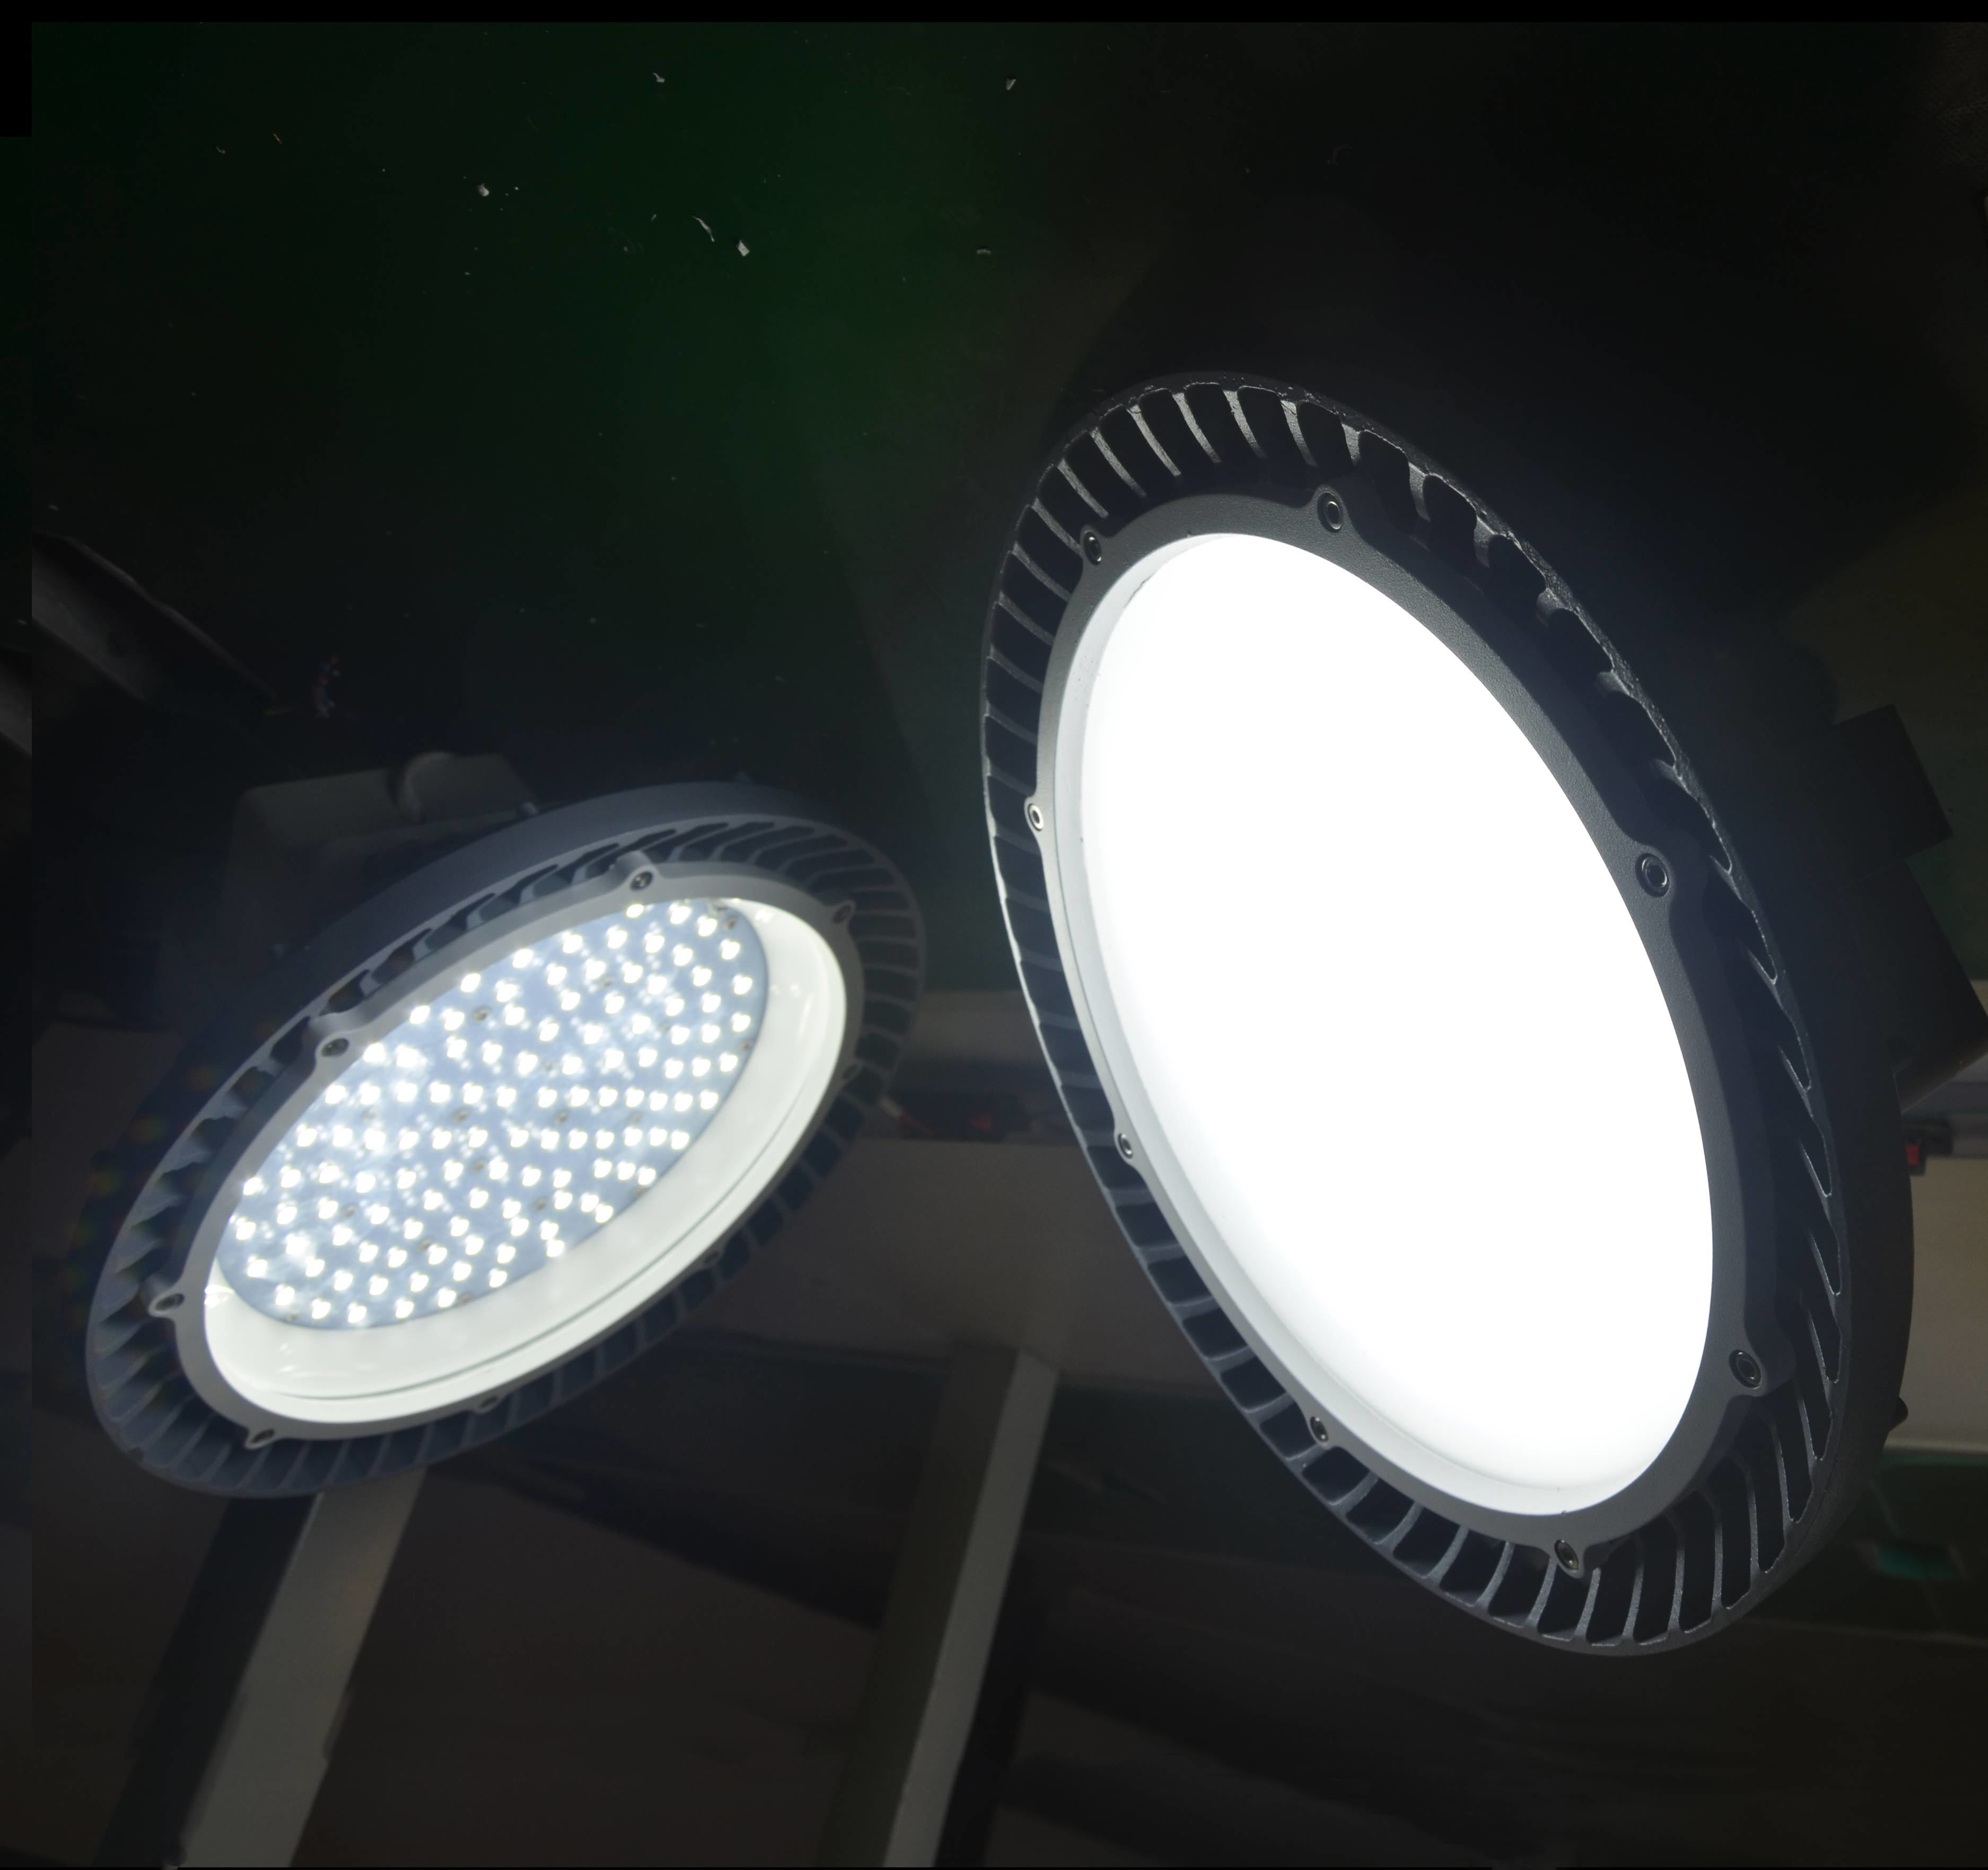 90W Outdoor LED High Bay Light (Bfz 220/90 Xx E)